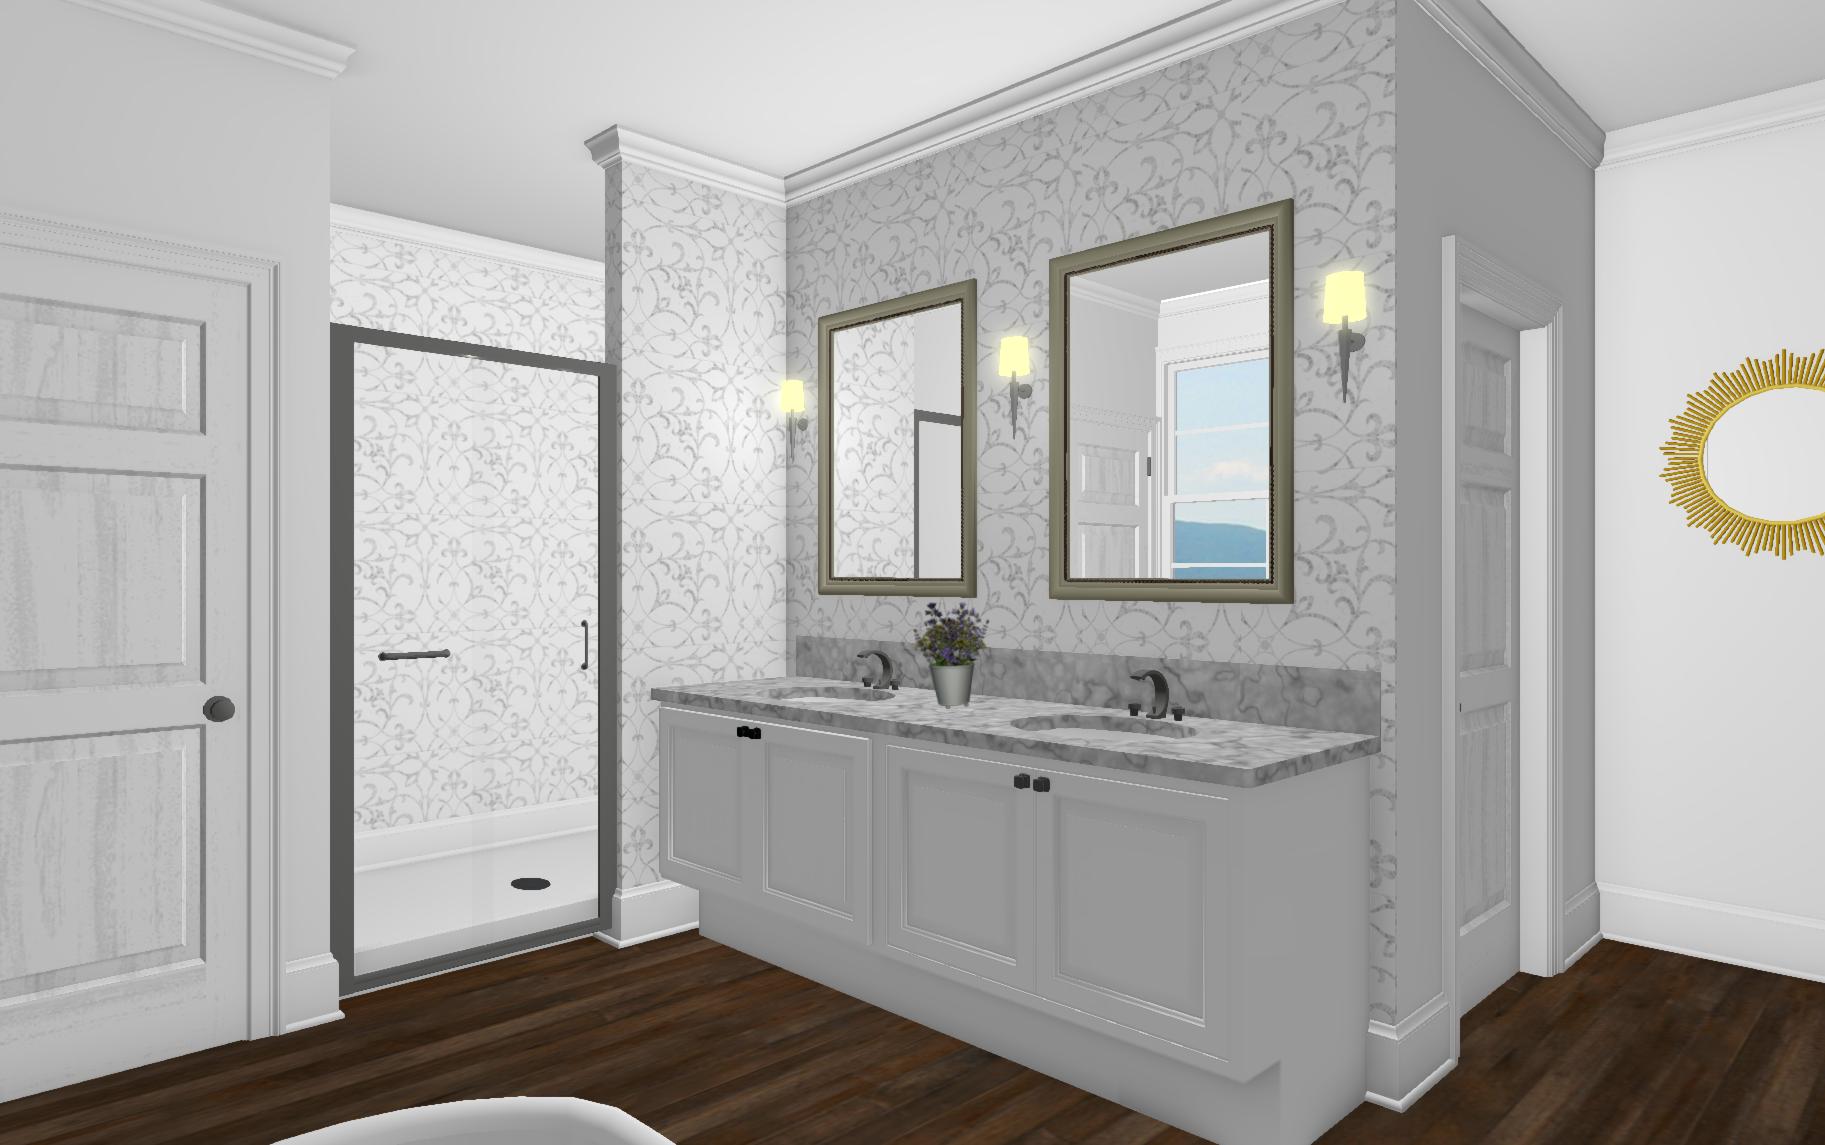 Kitchen & Bath Design I Frances Lauren Interiors